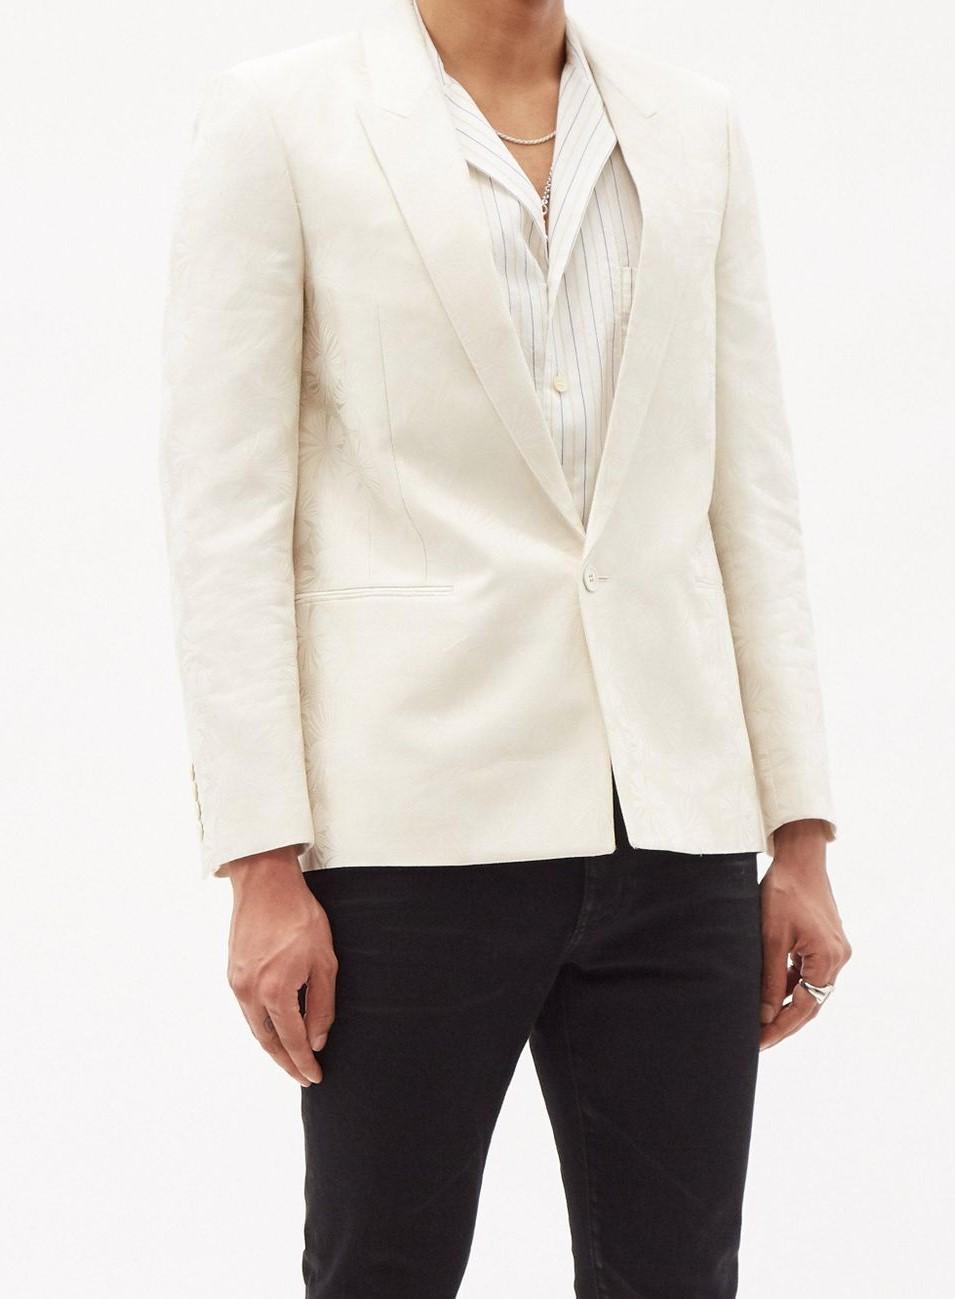 saint-laurent-white-Single-breasted-Floral-jacquard-Wool-blend-Blazer